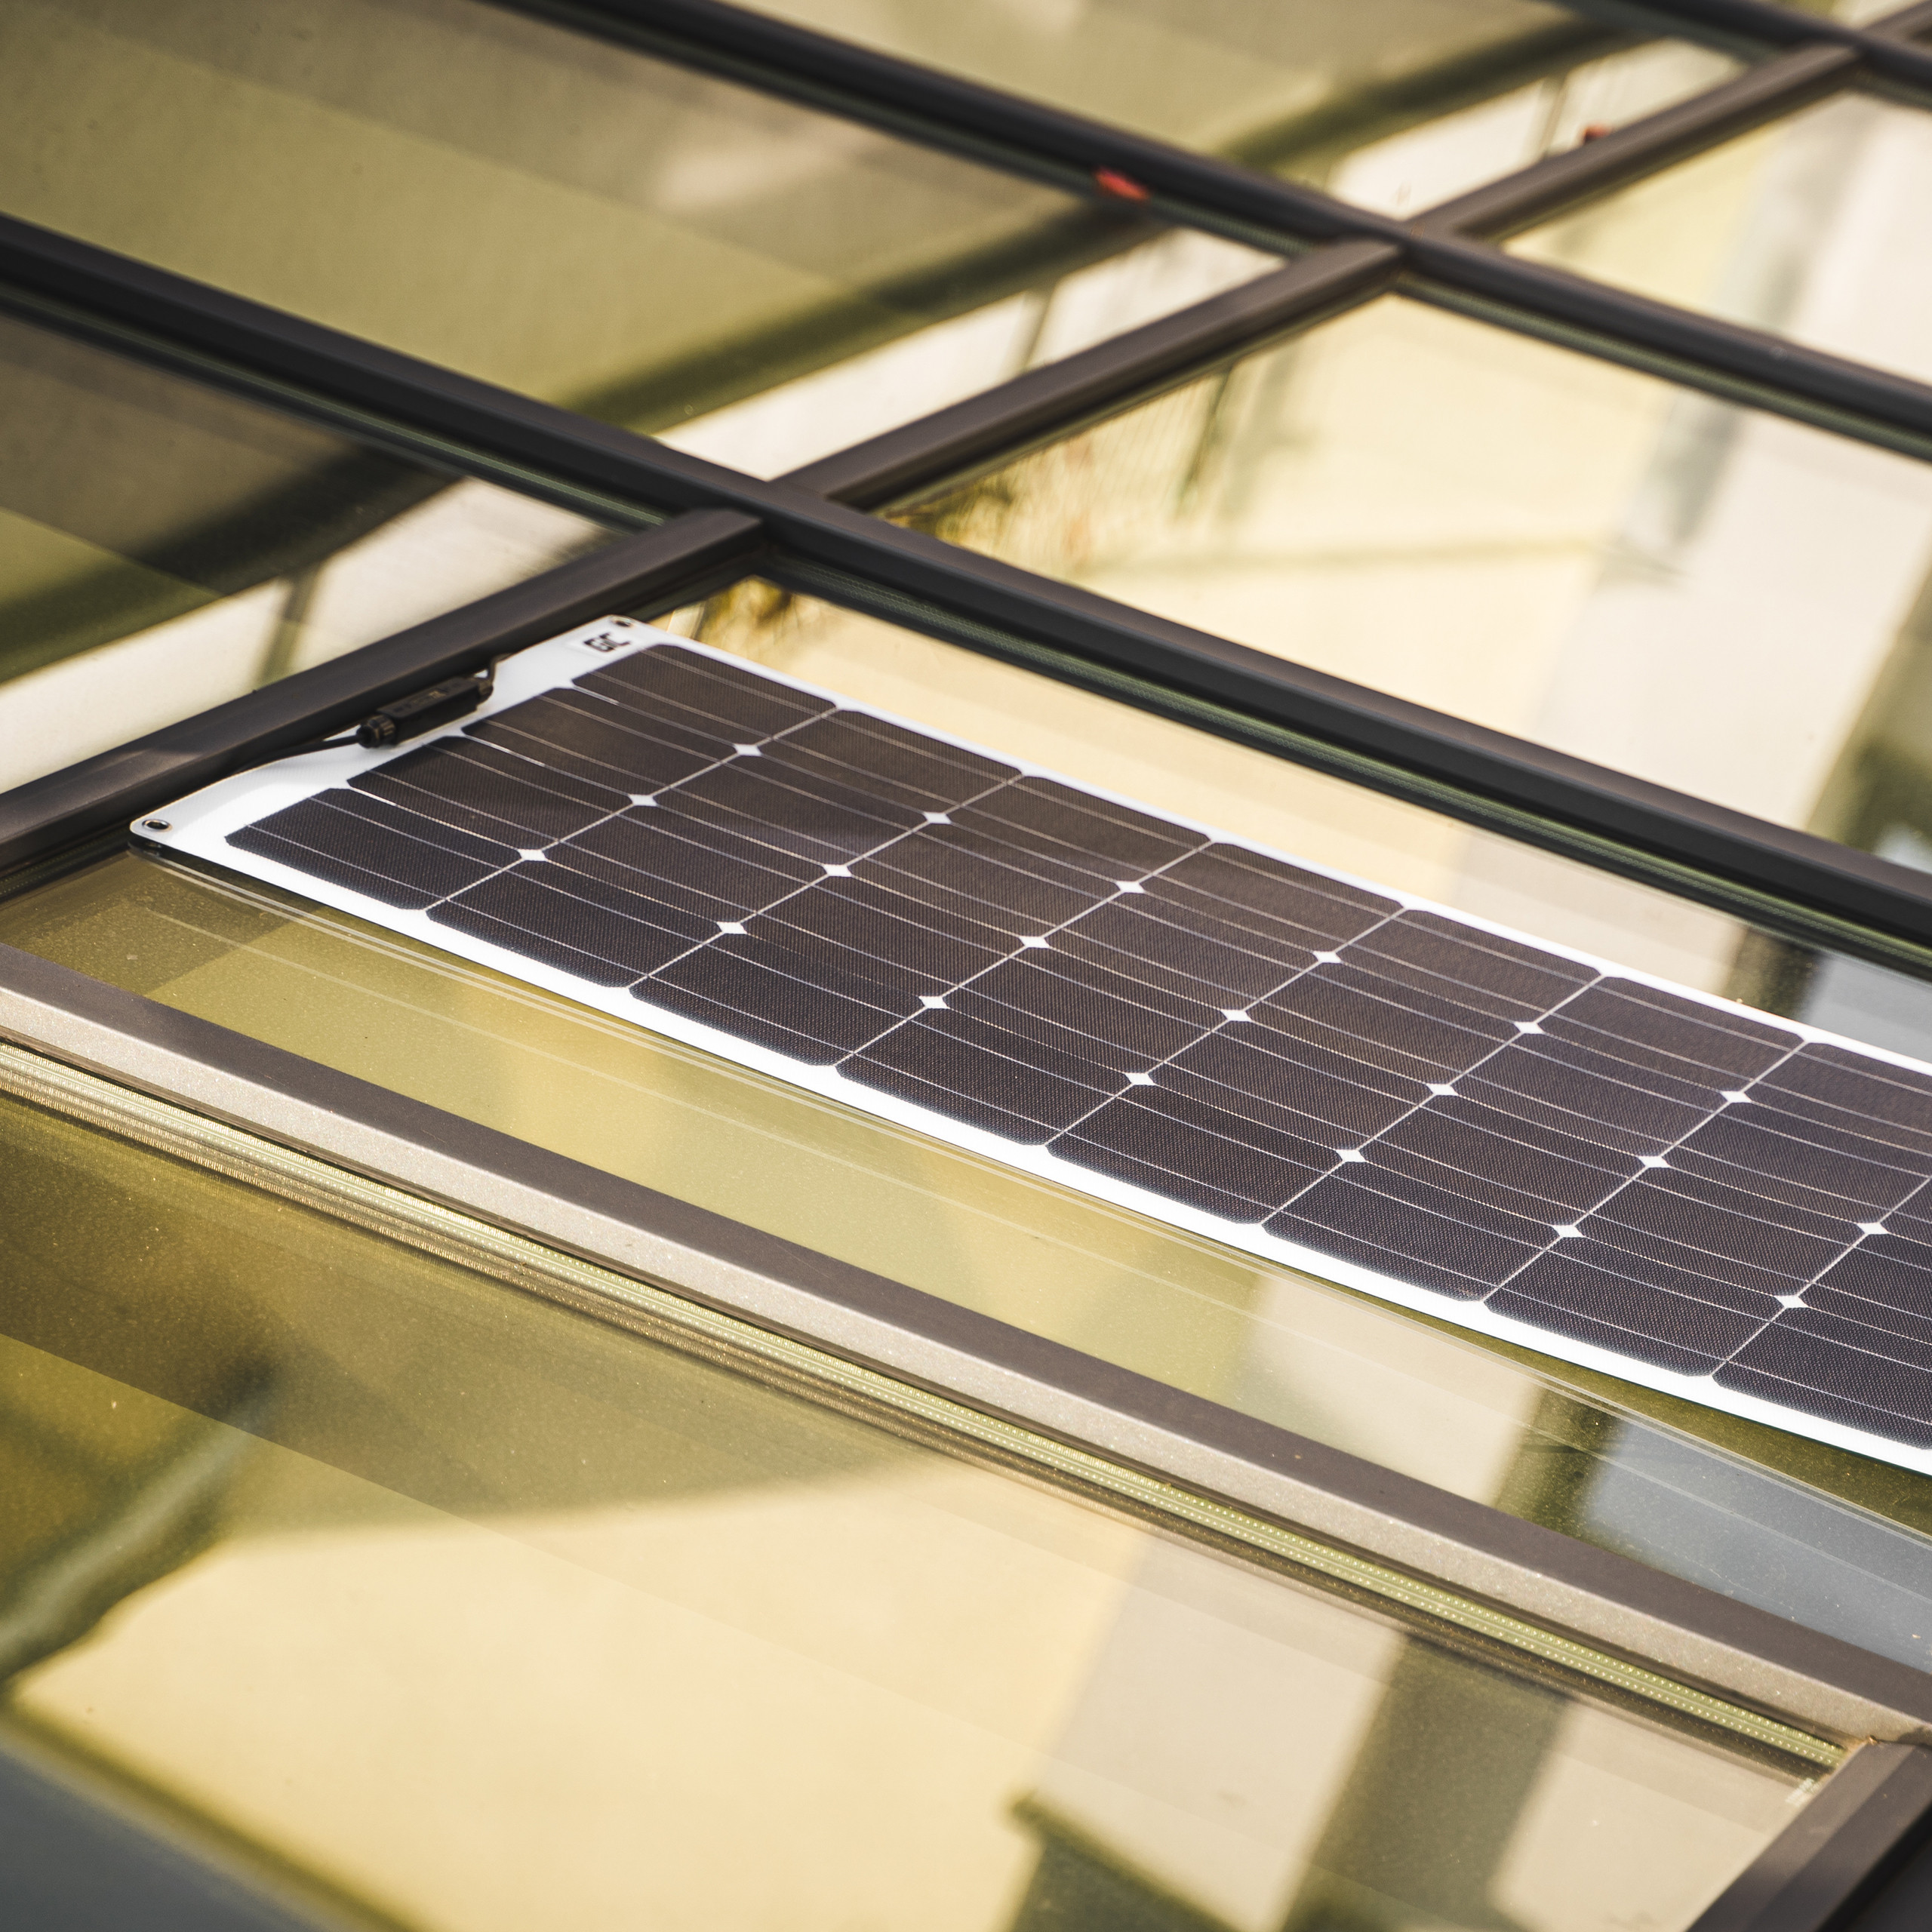 Flexible Solar panel Solar module Green Cell GC SolarFlex 100W / Monocrystalline / 12V 18V / ETFE / MC4